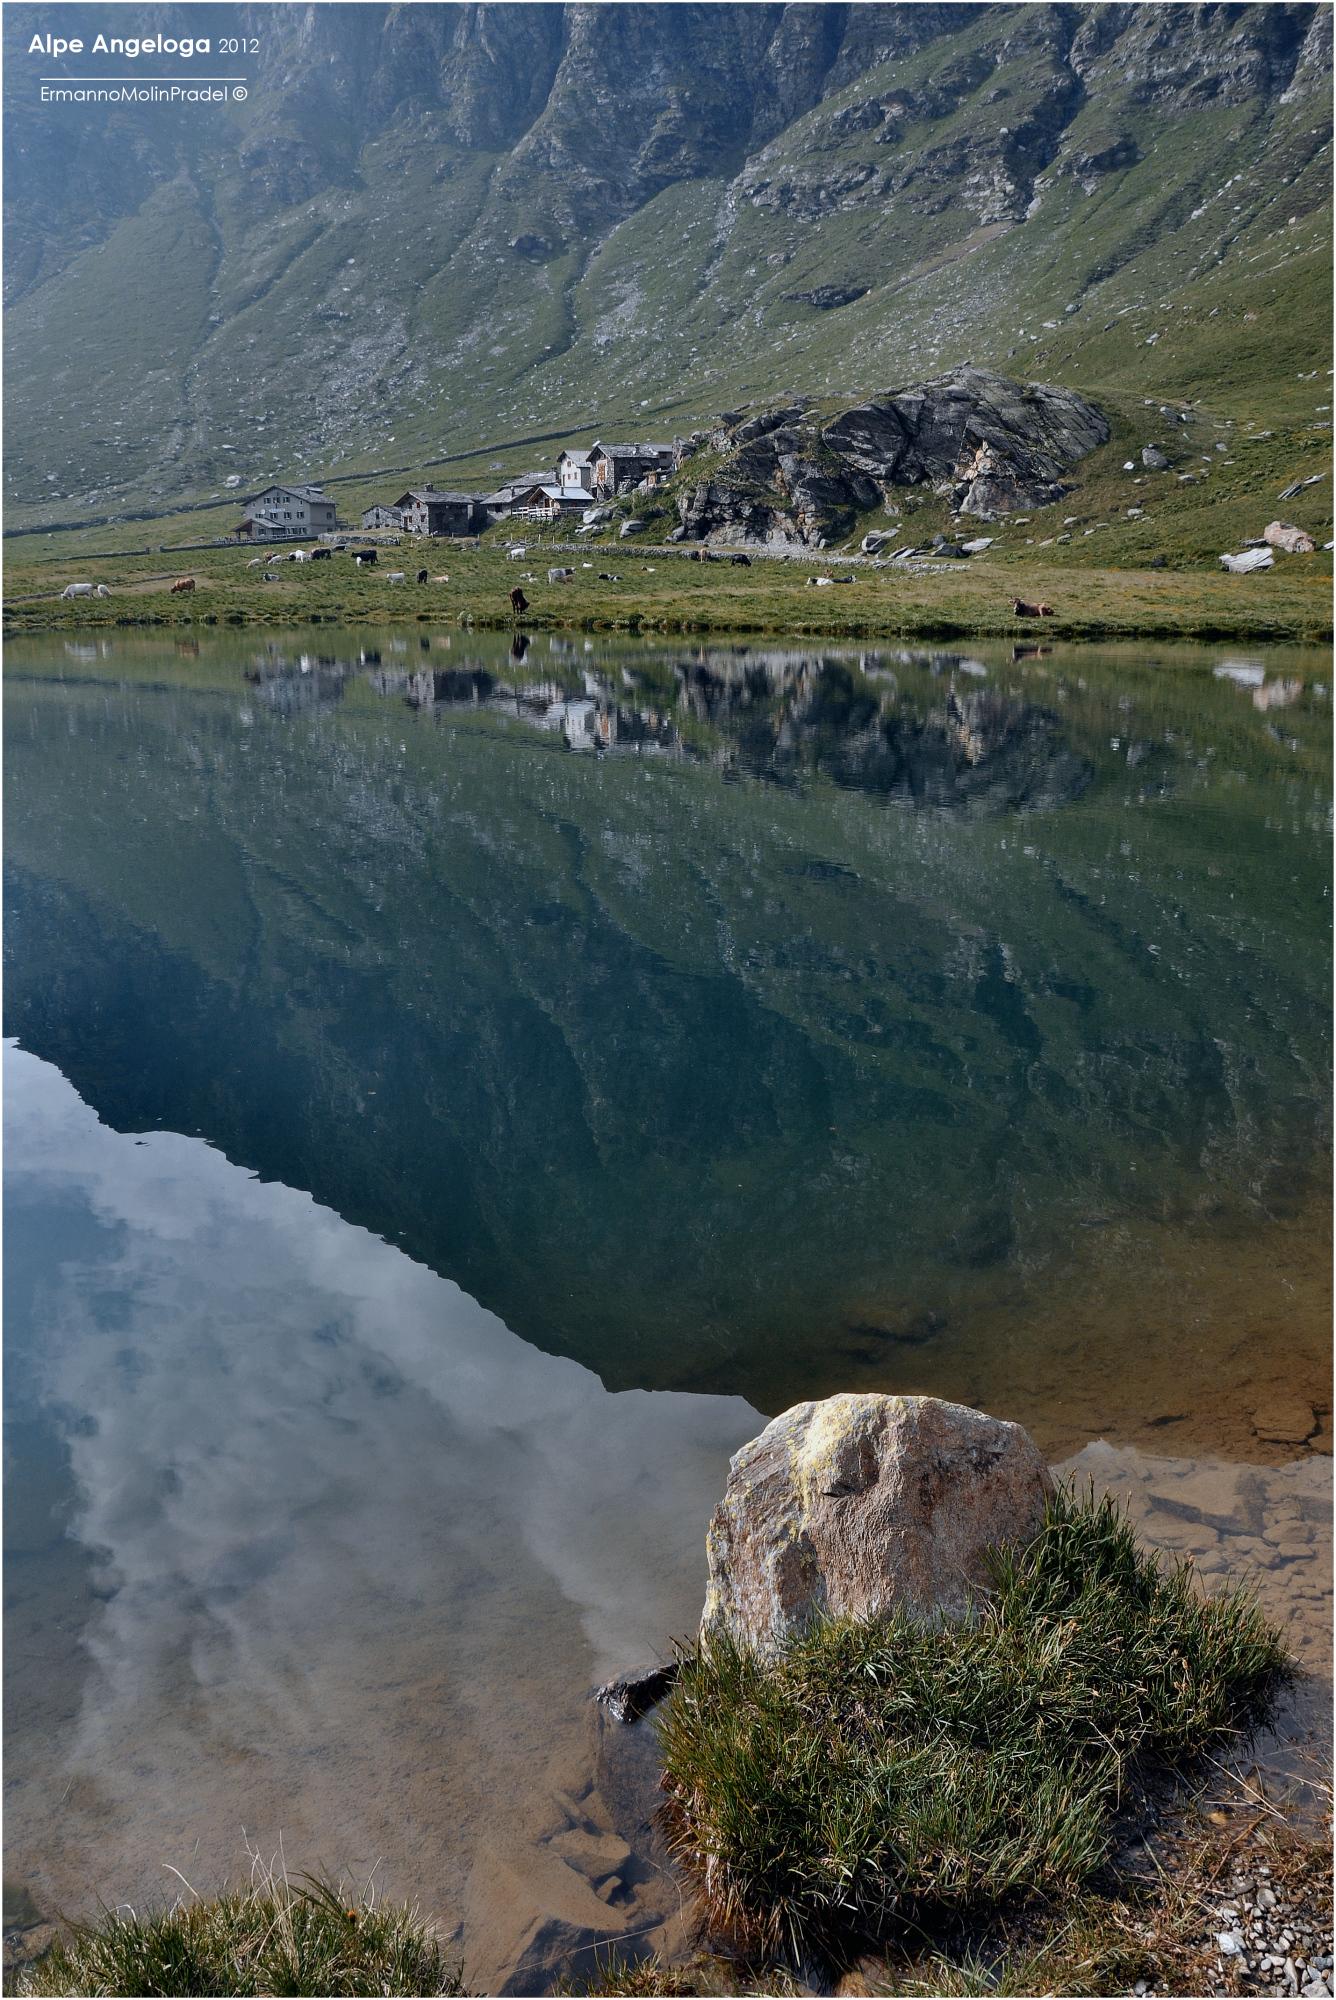 all'Alpe Angeloga...